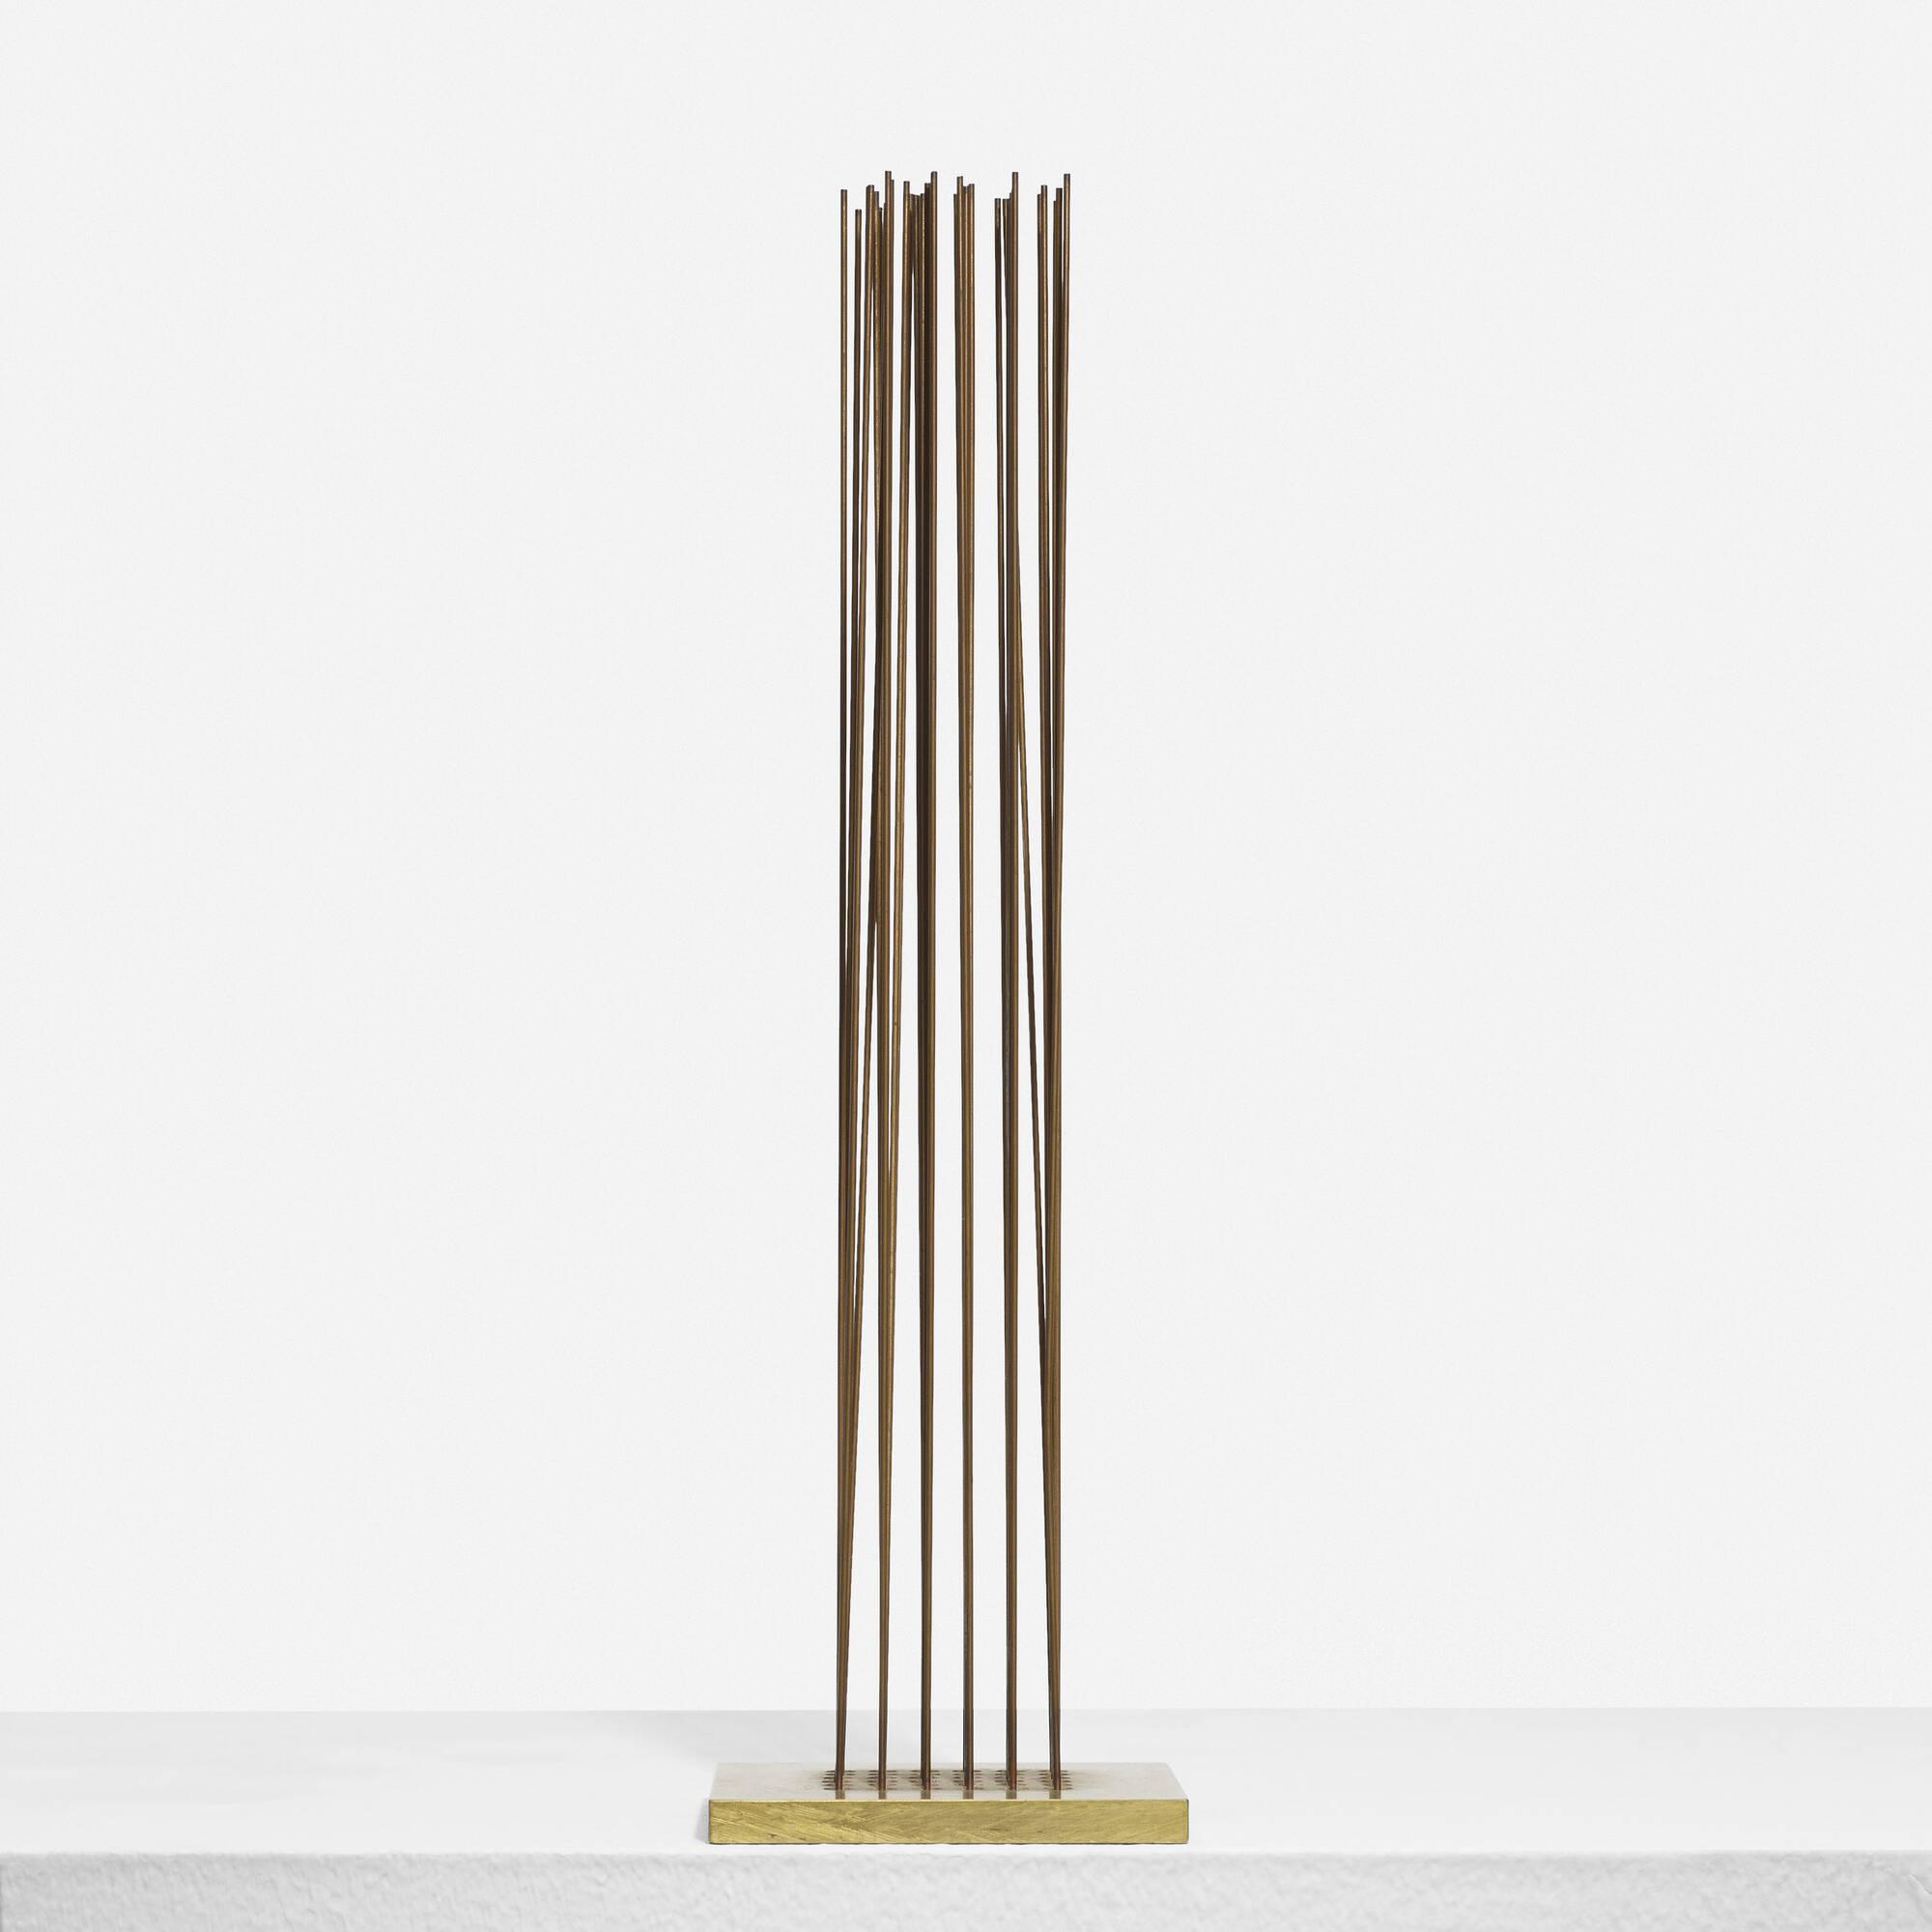 137: Harry Bertoia / Untitled (Sonambient) (2 of 3)